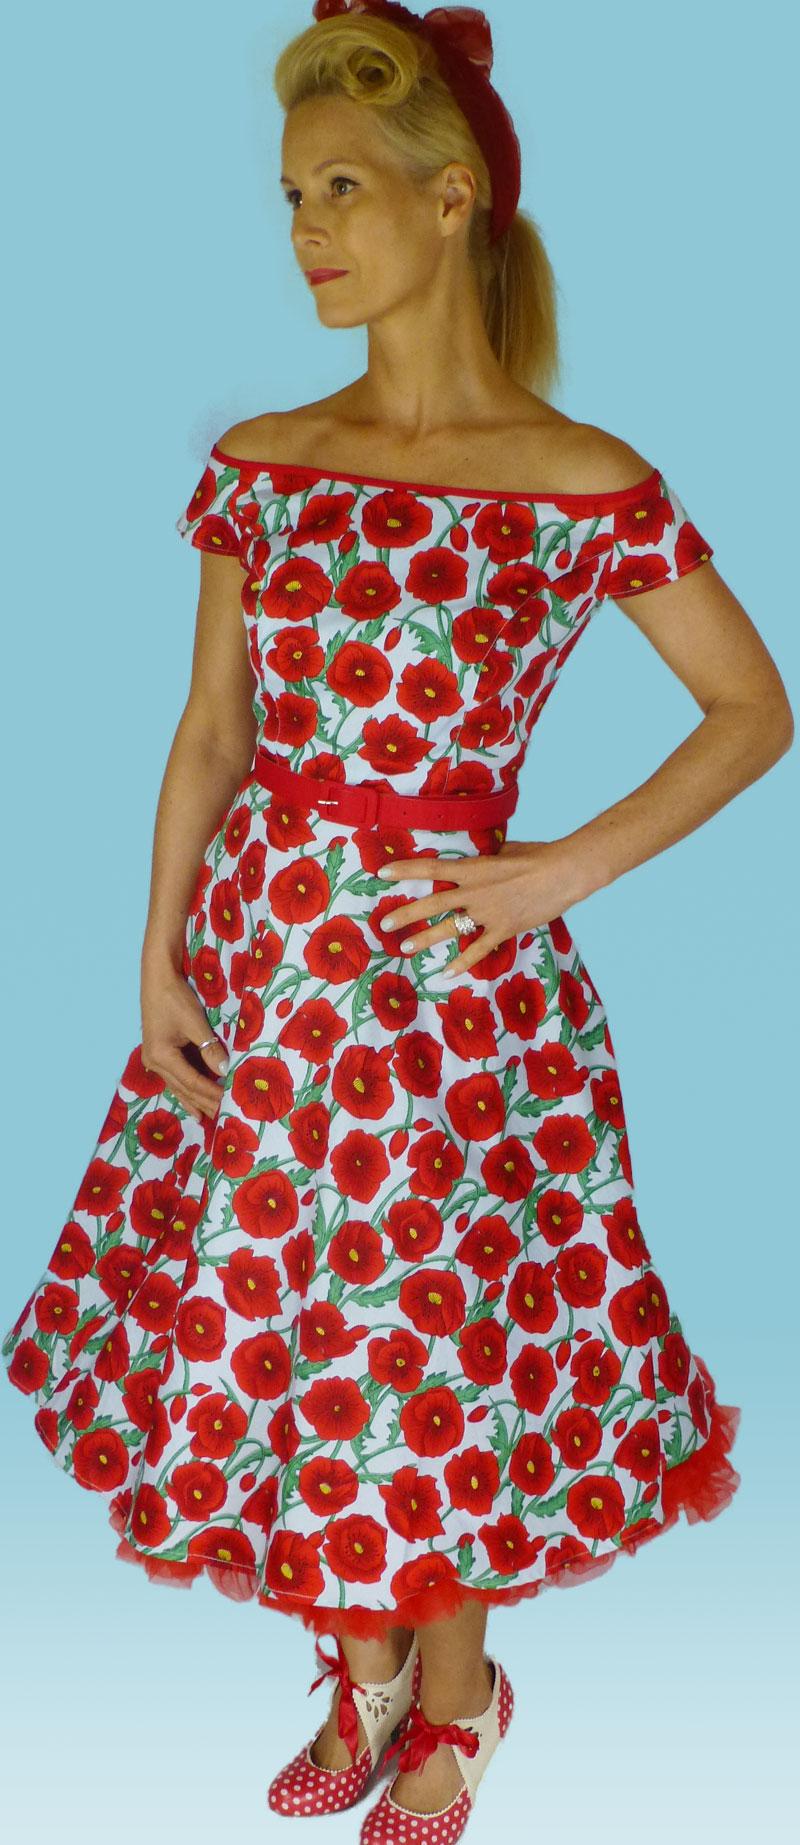 1950s-Retro-Dresses